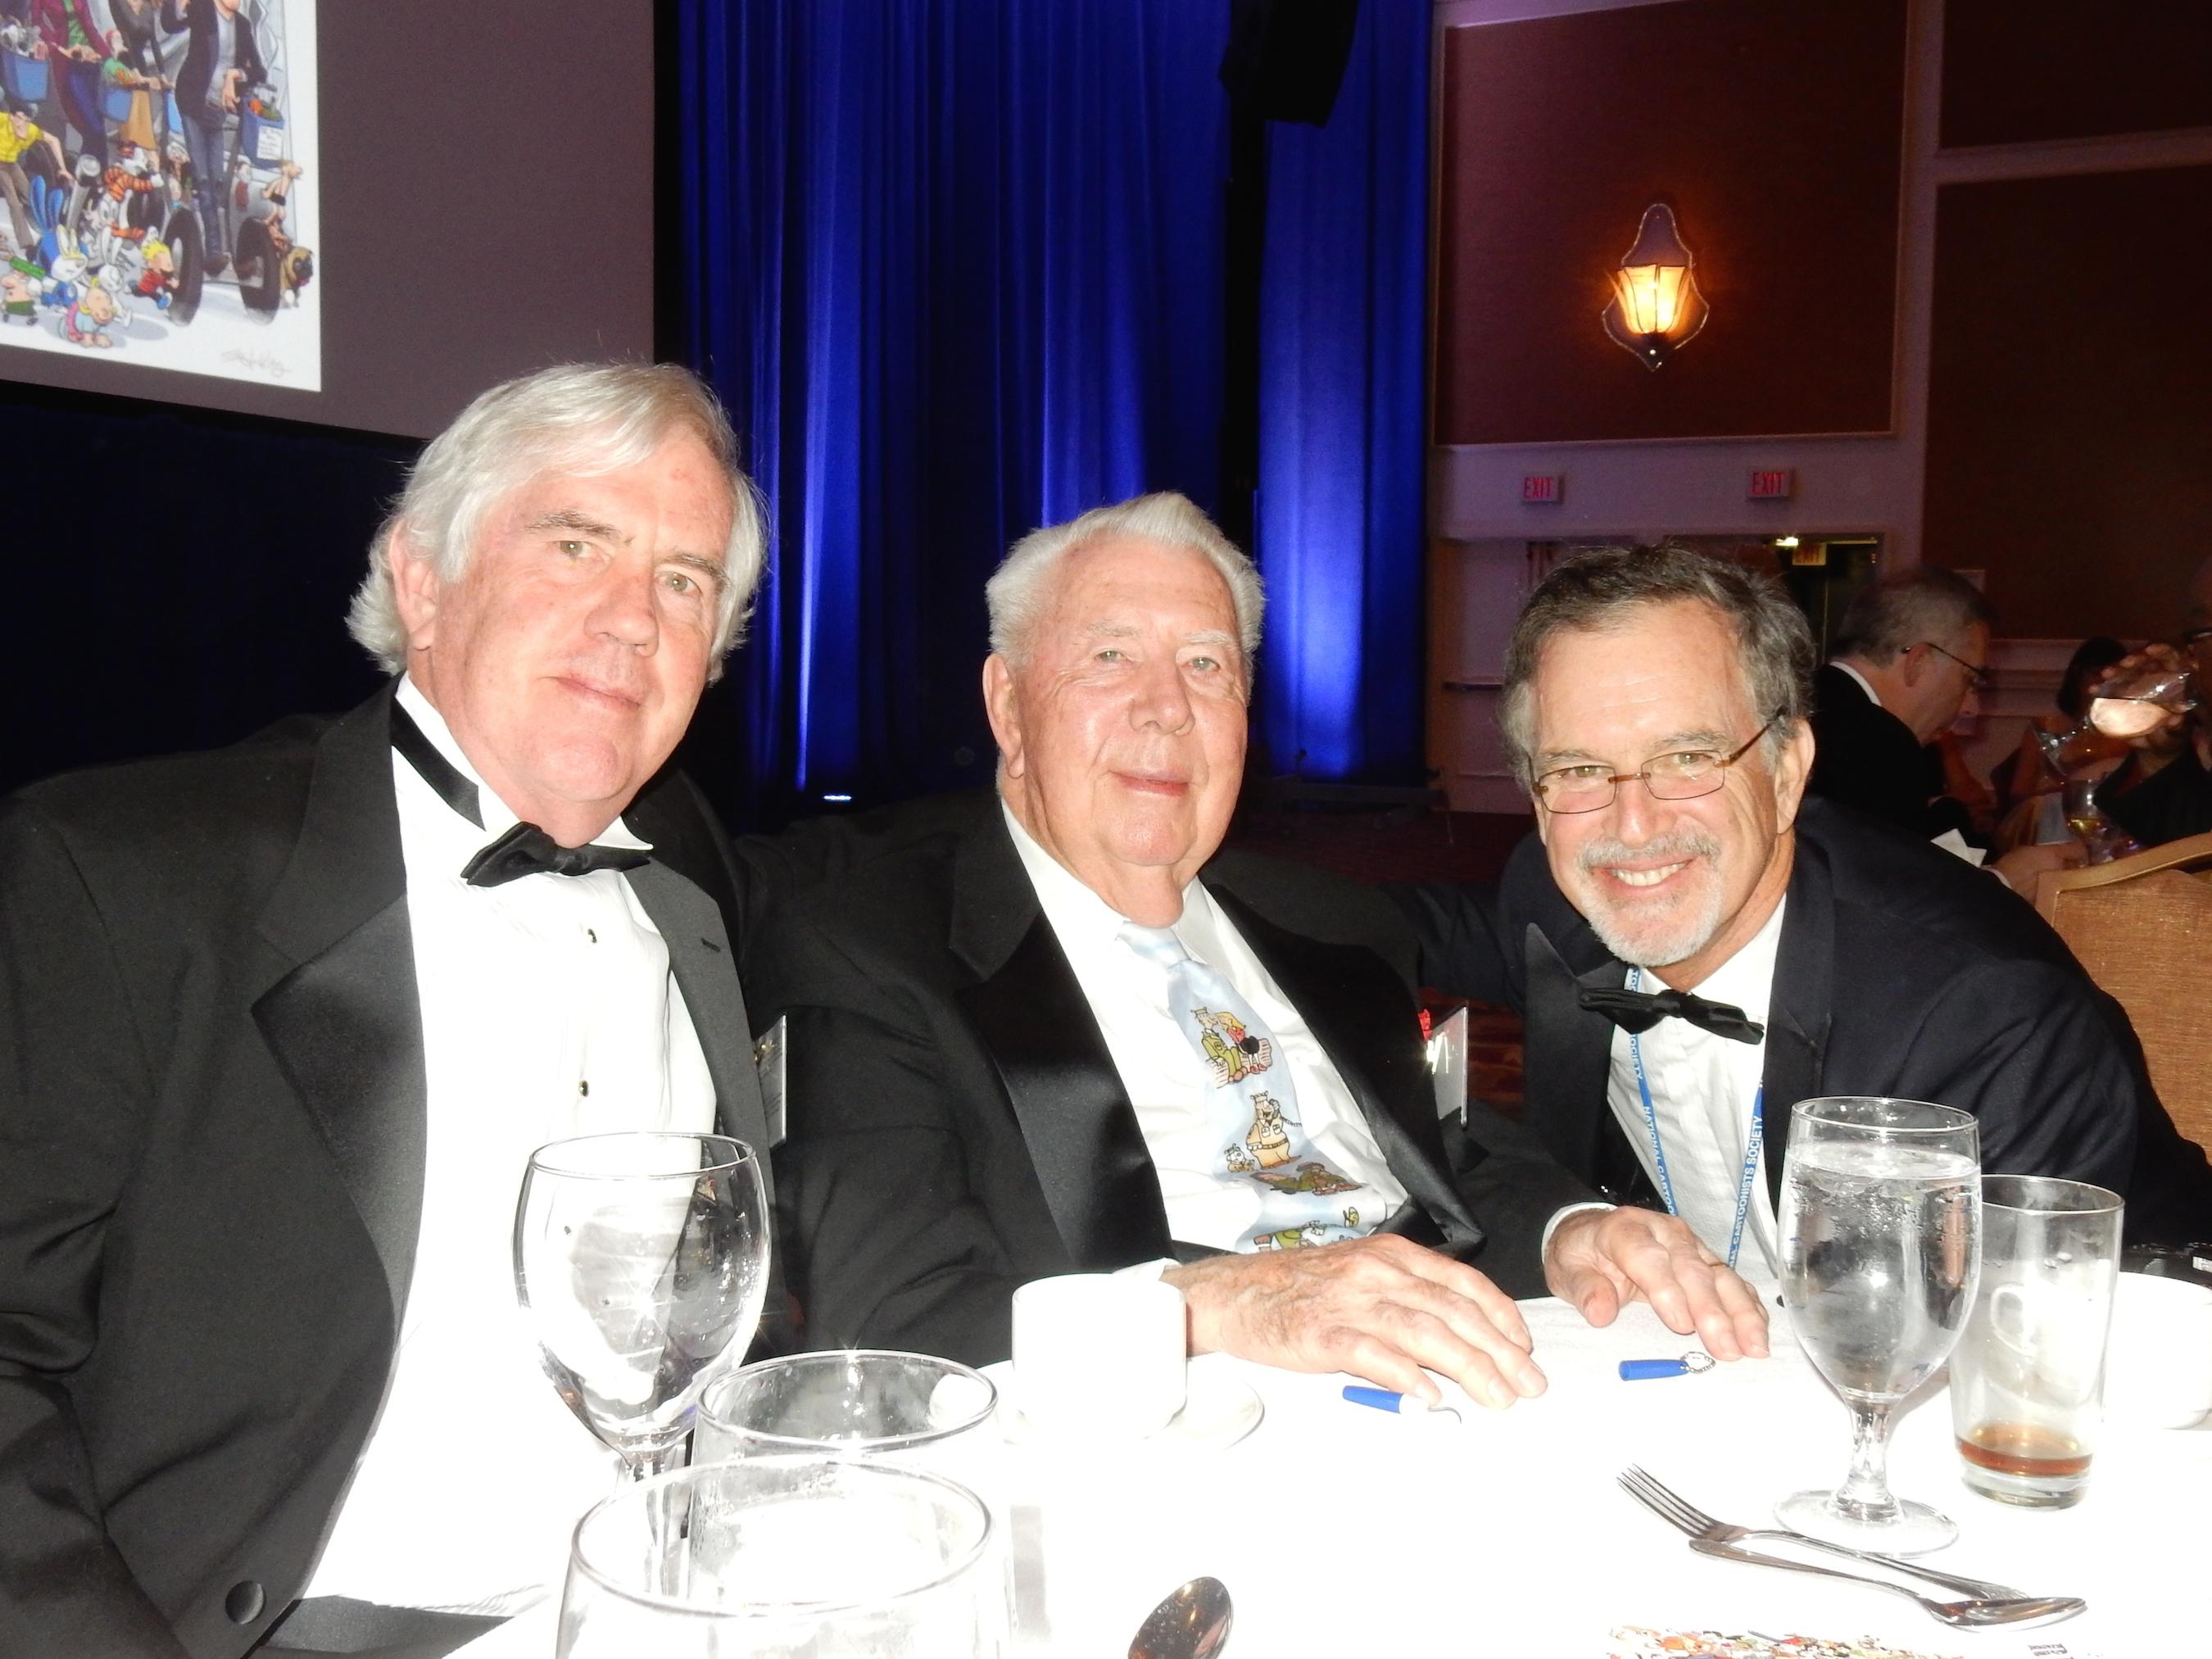 Left to right:  Brian Walker, Mort Walker, Garry Trudeau